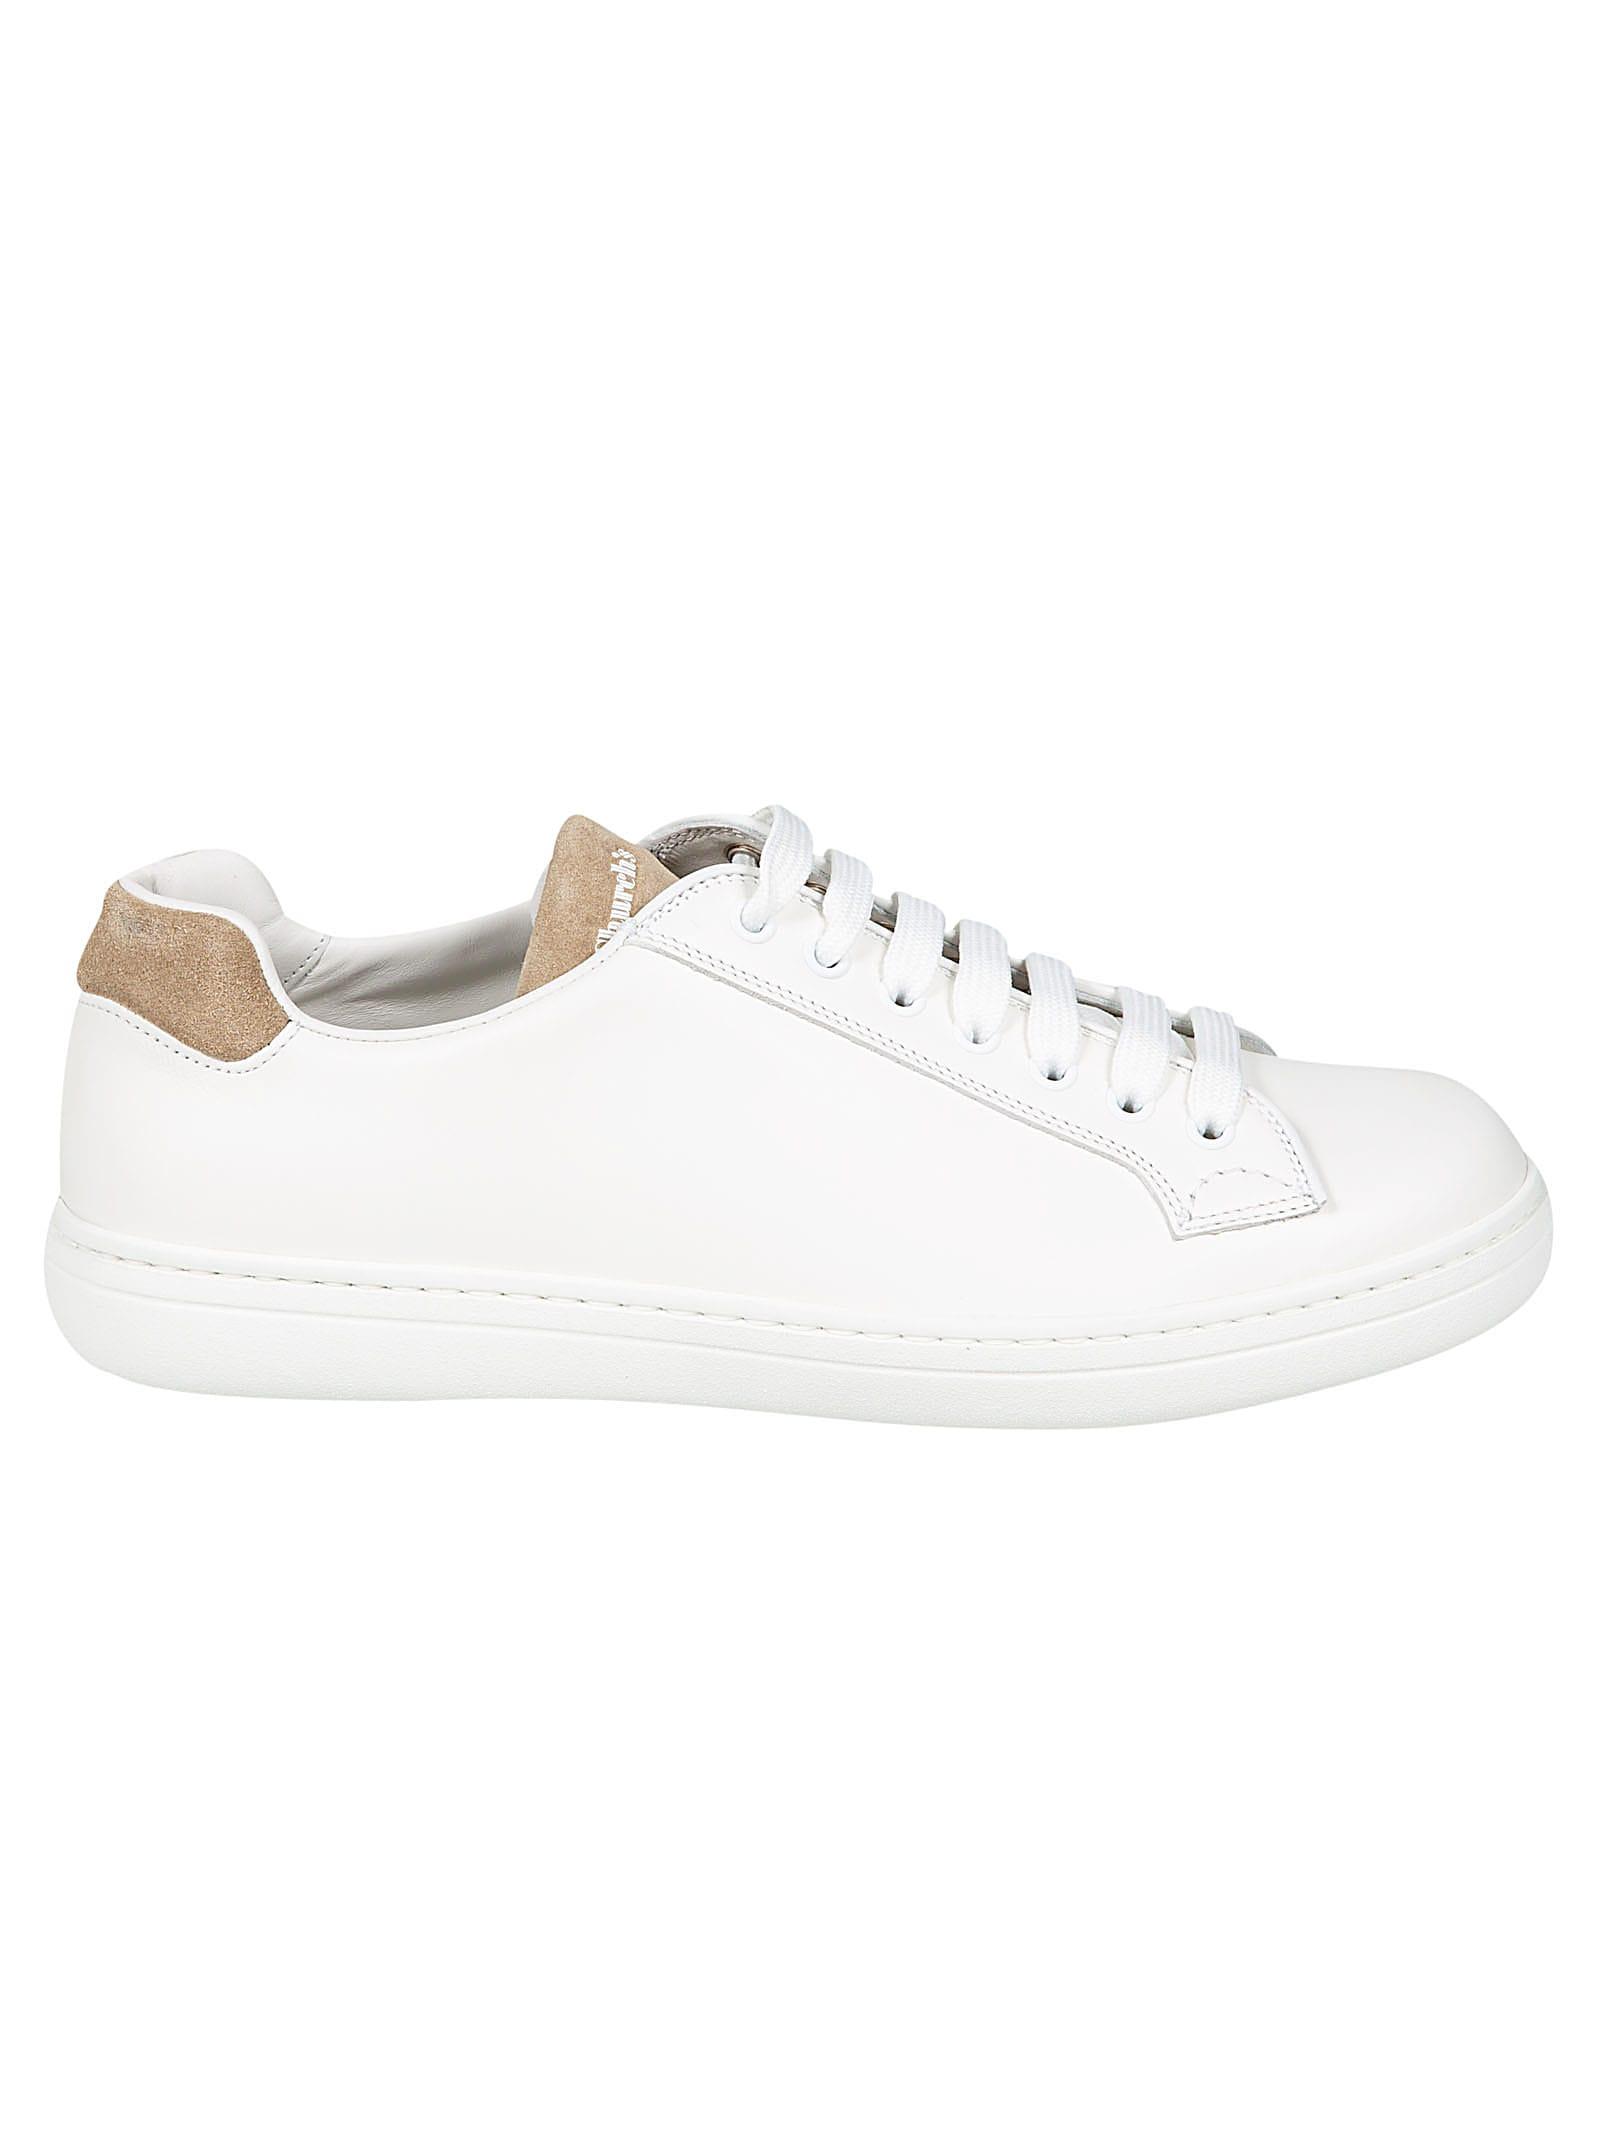 Churchs Classic Sneakers